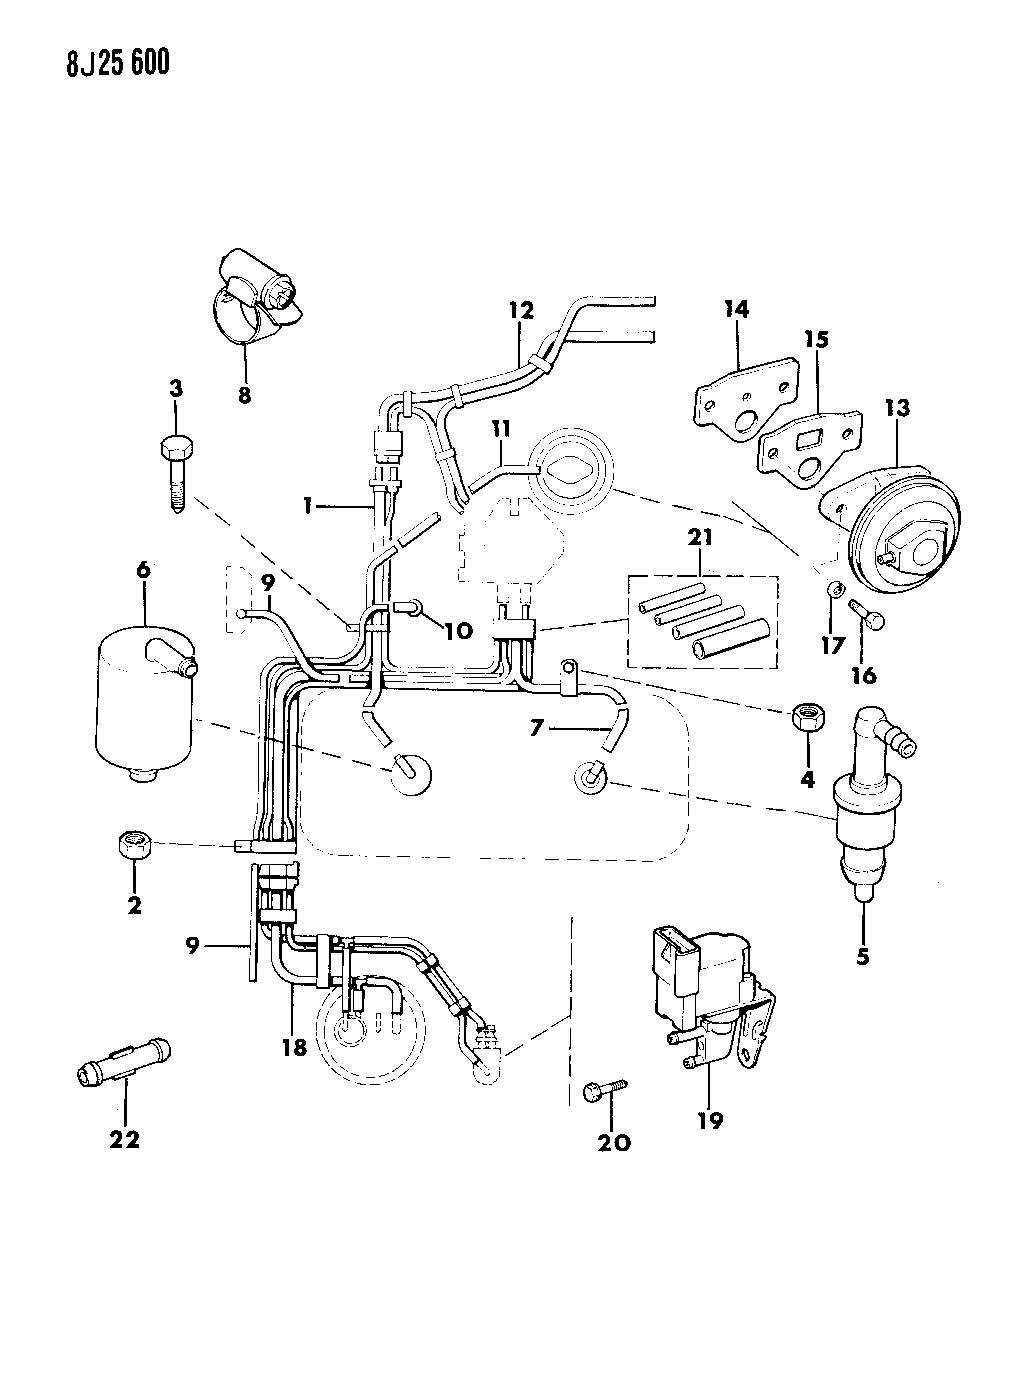 1987 jeep wrangler 4 2 vacuum diagram jeep auto fuse box. Black Bedroom Furniture Sets. Home Design Ideas